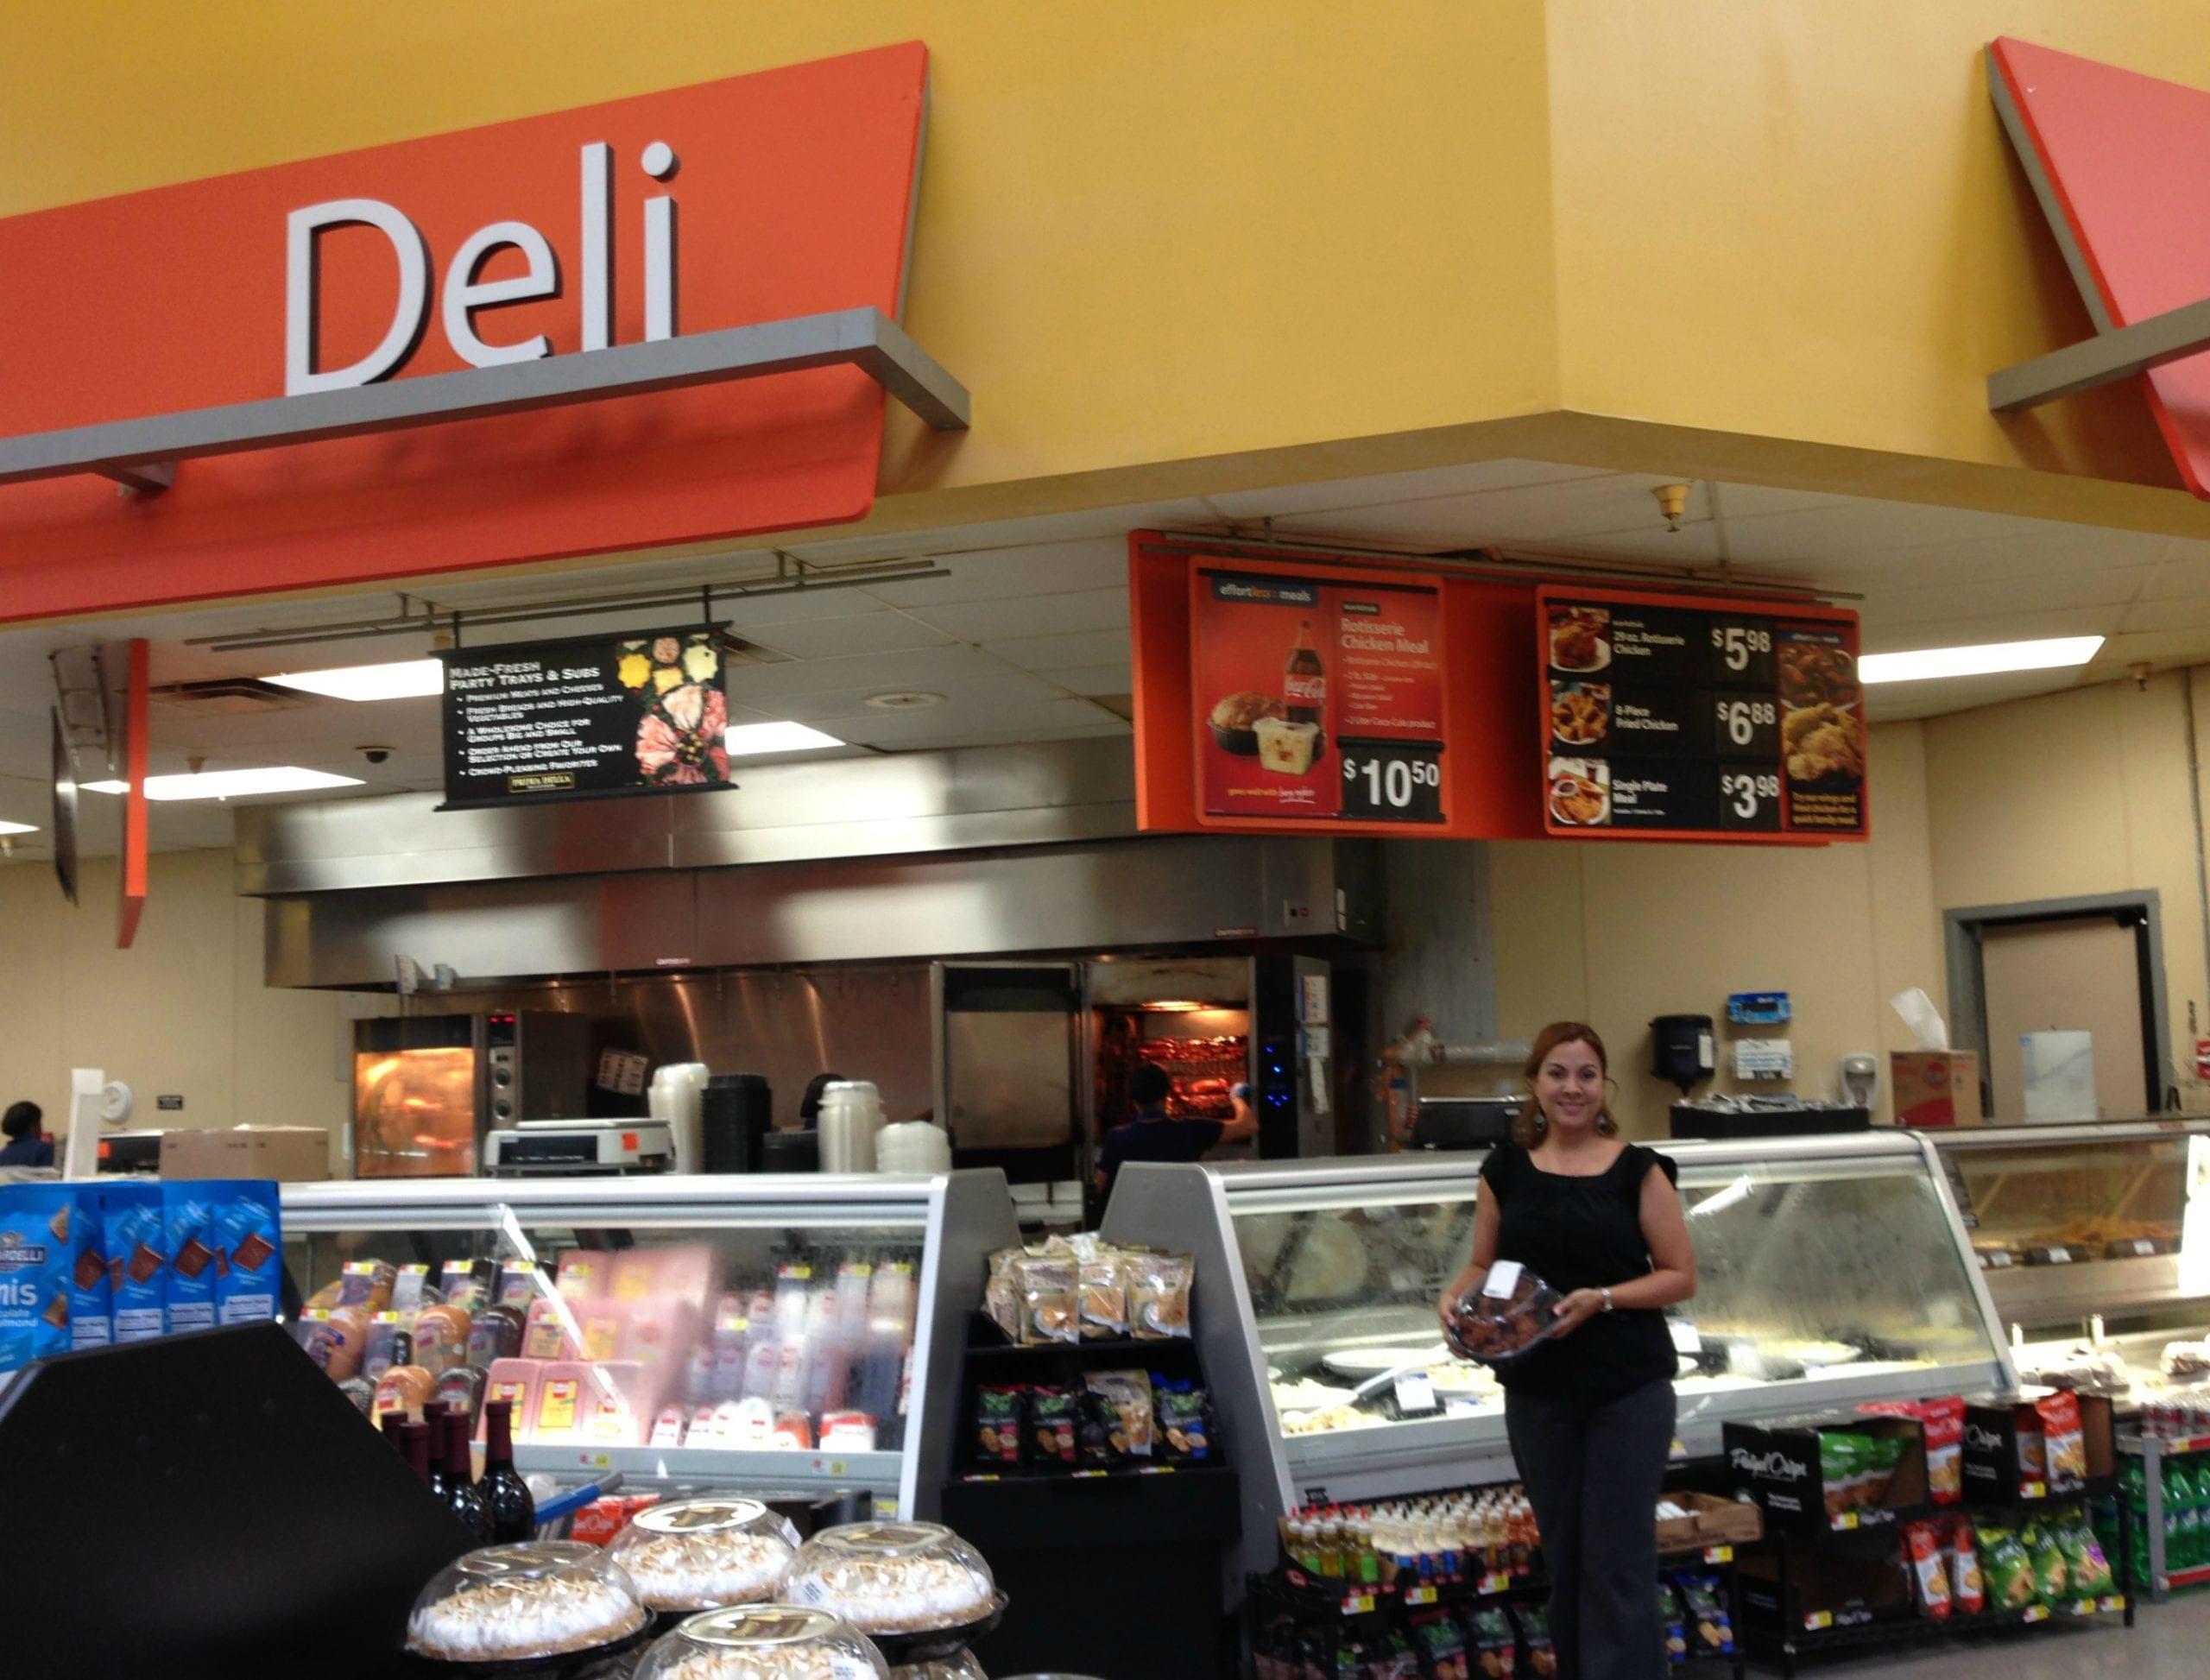 ad Deli Wings Mini Ciabatta Sandwiches - My Sweet Zepol